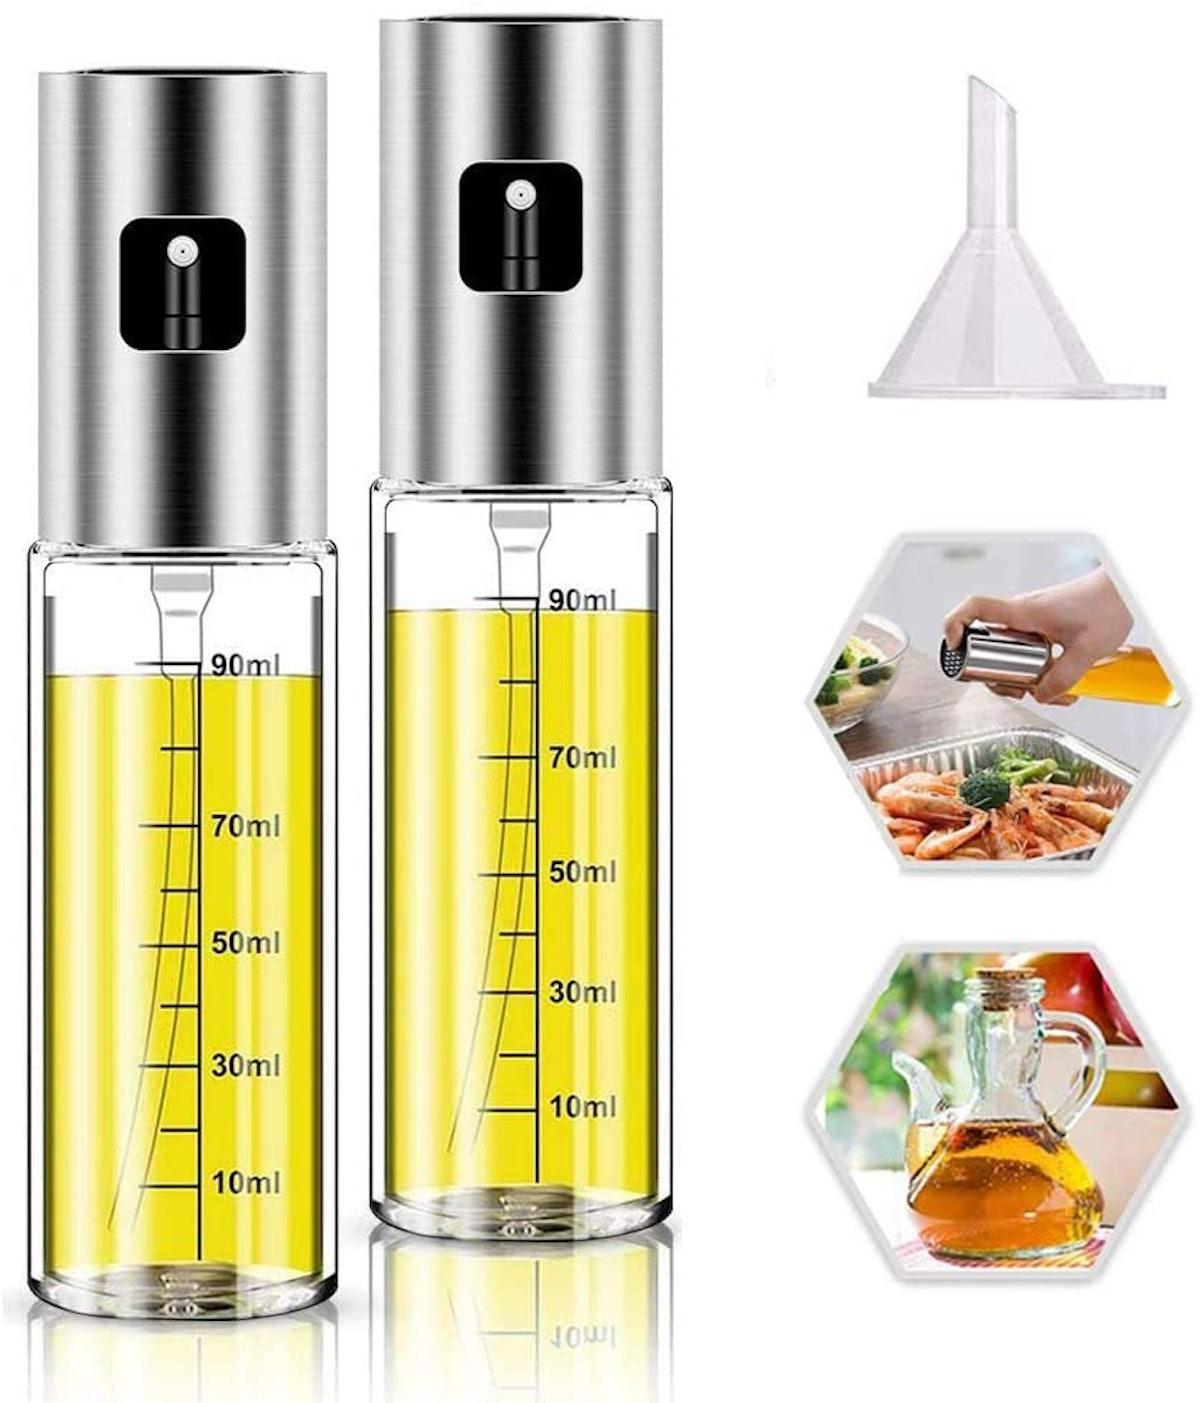 PUZMUG Cooking Oil Sprayers (2-Pack)